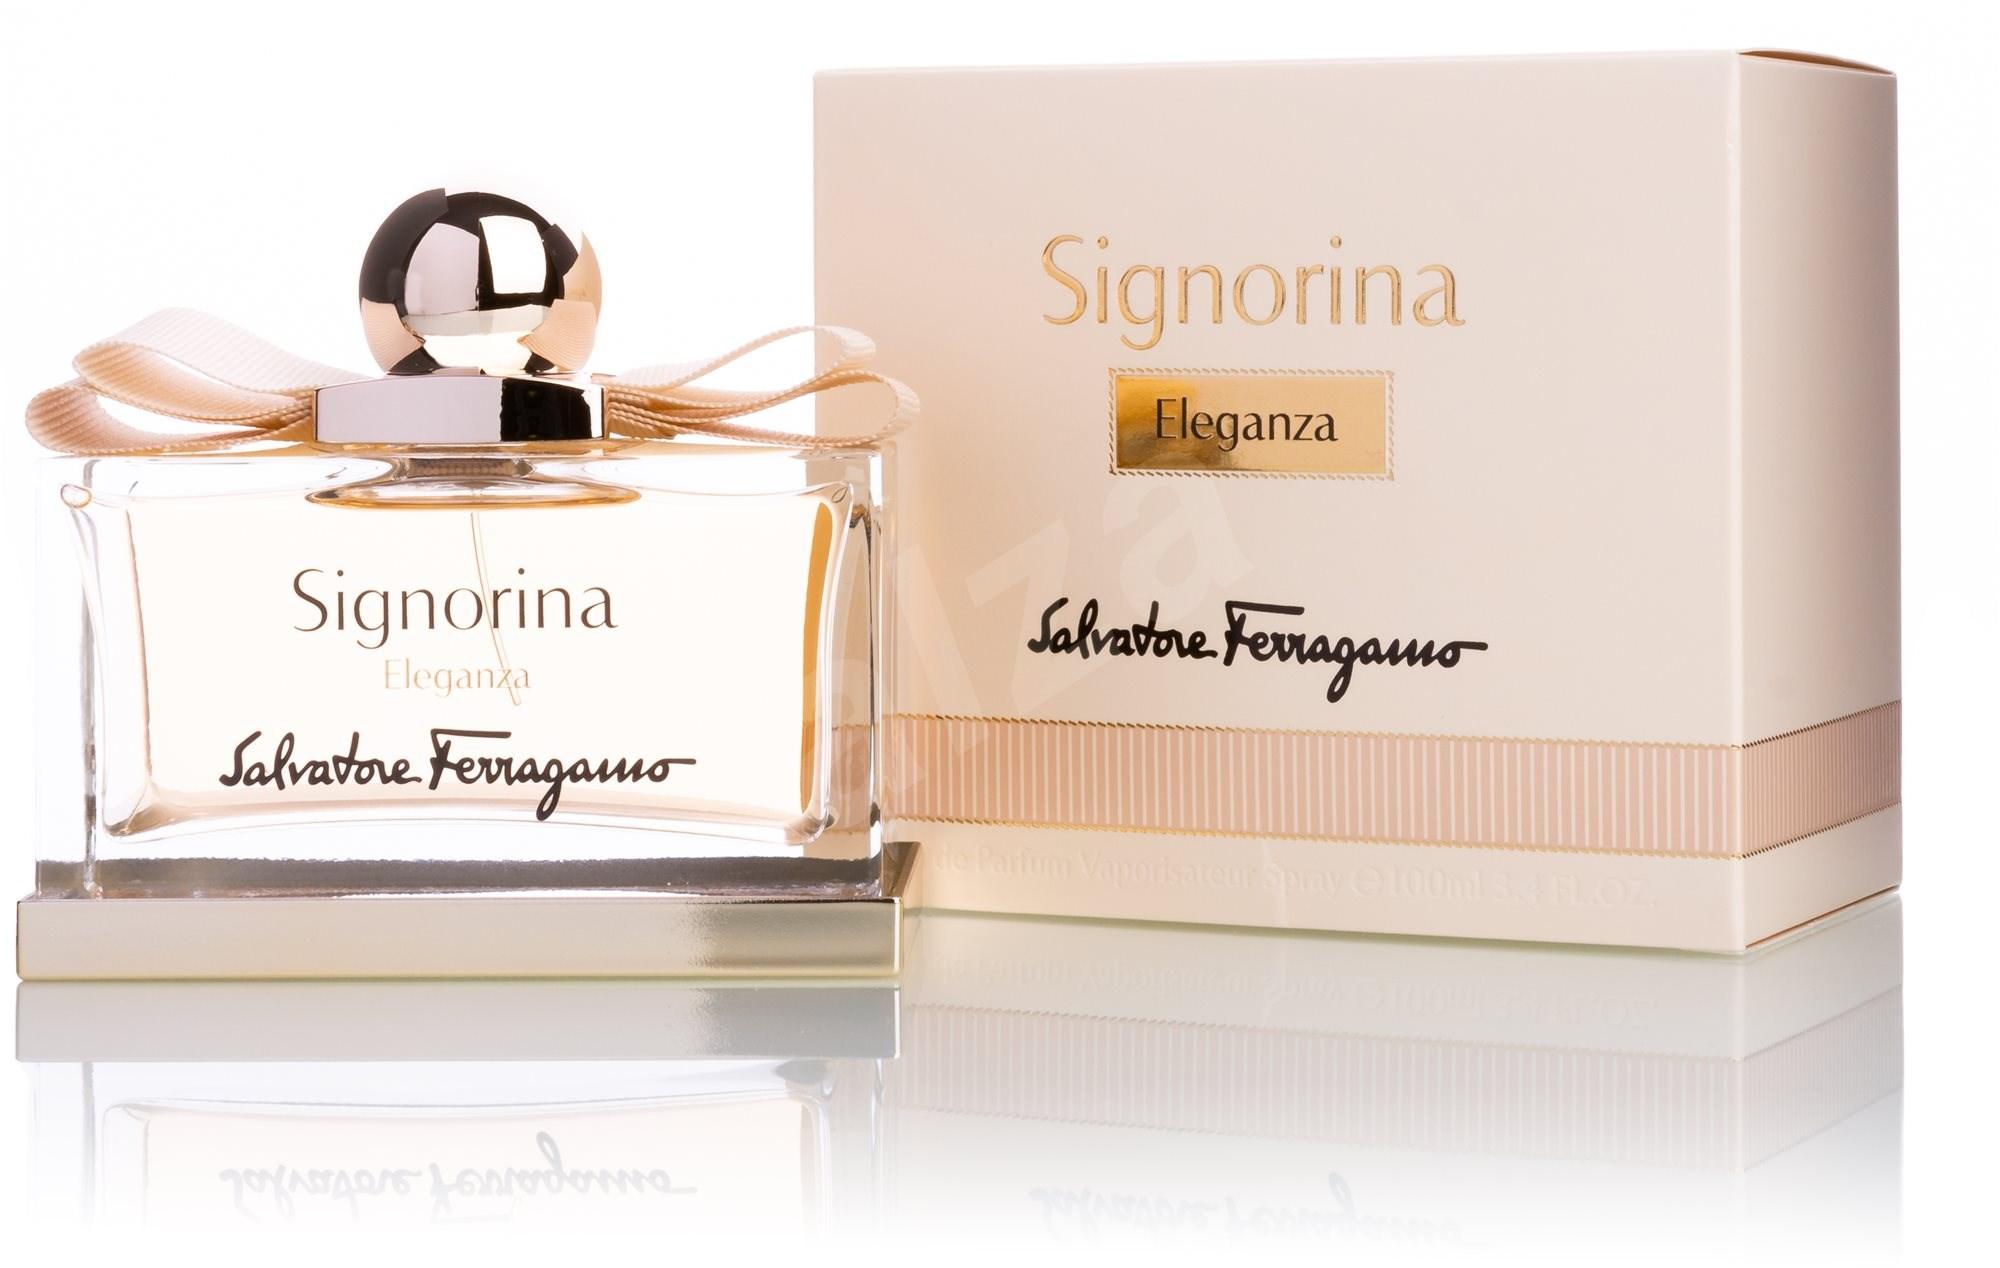 Salvatore Ferragamo Signorina Eleganza 100 ml - Parfüm